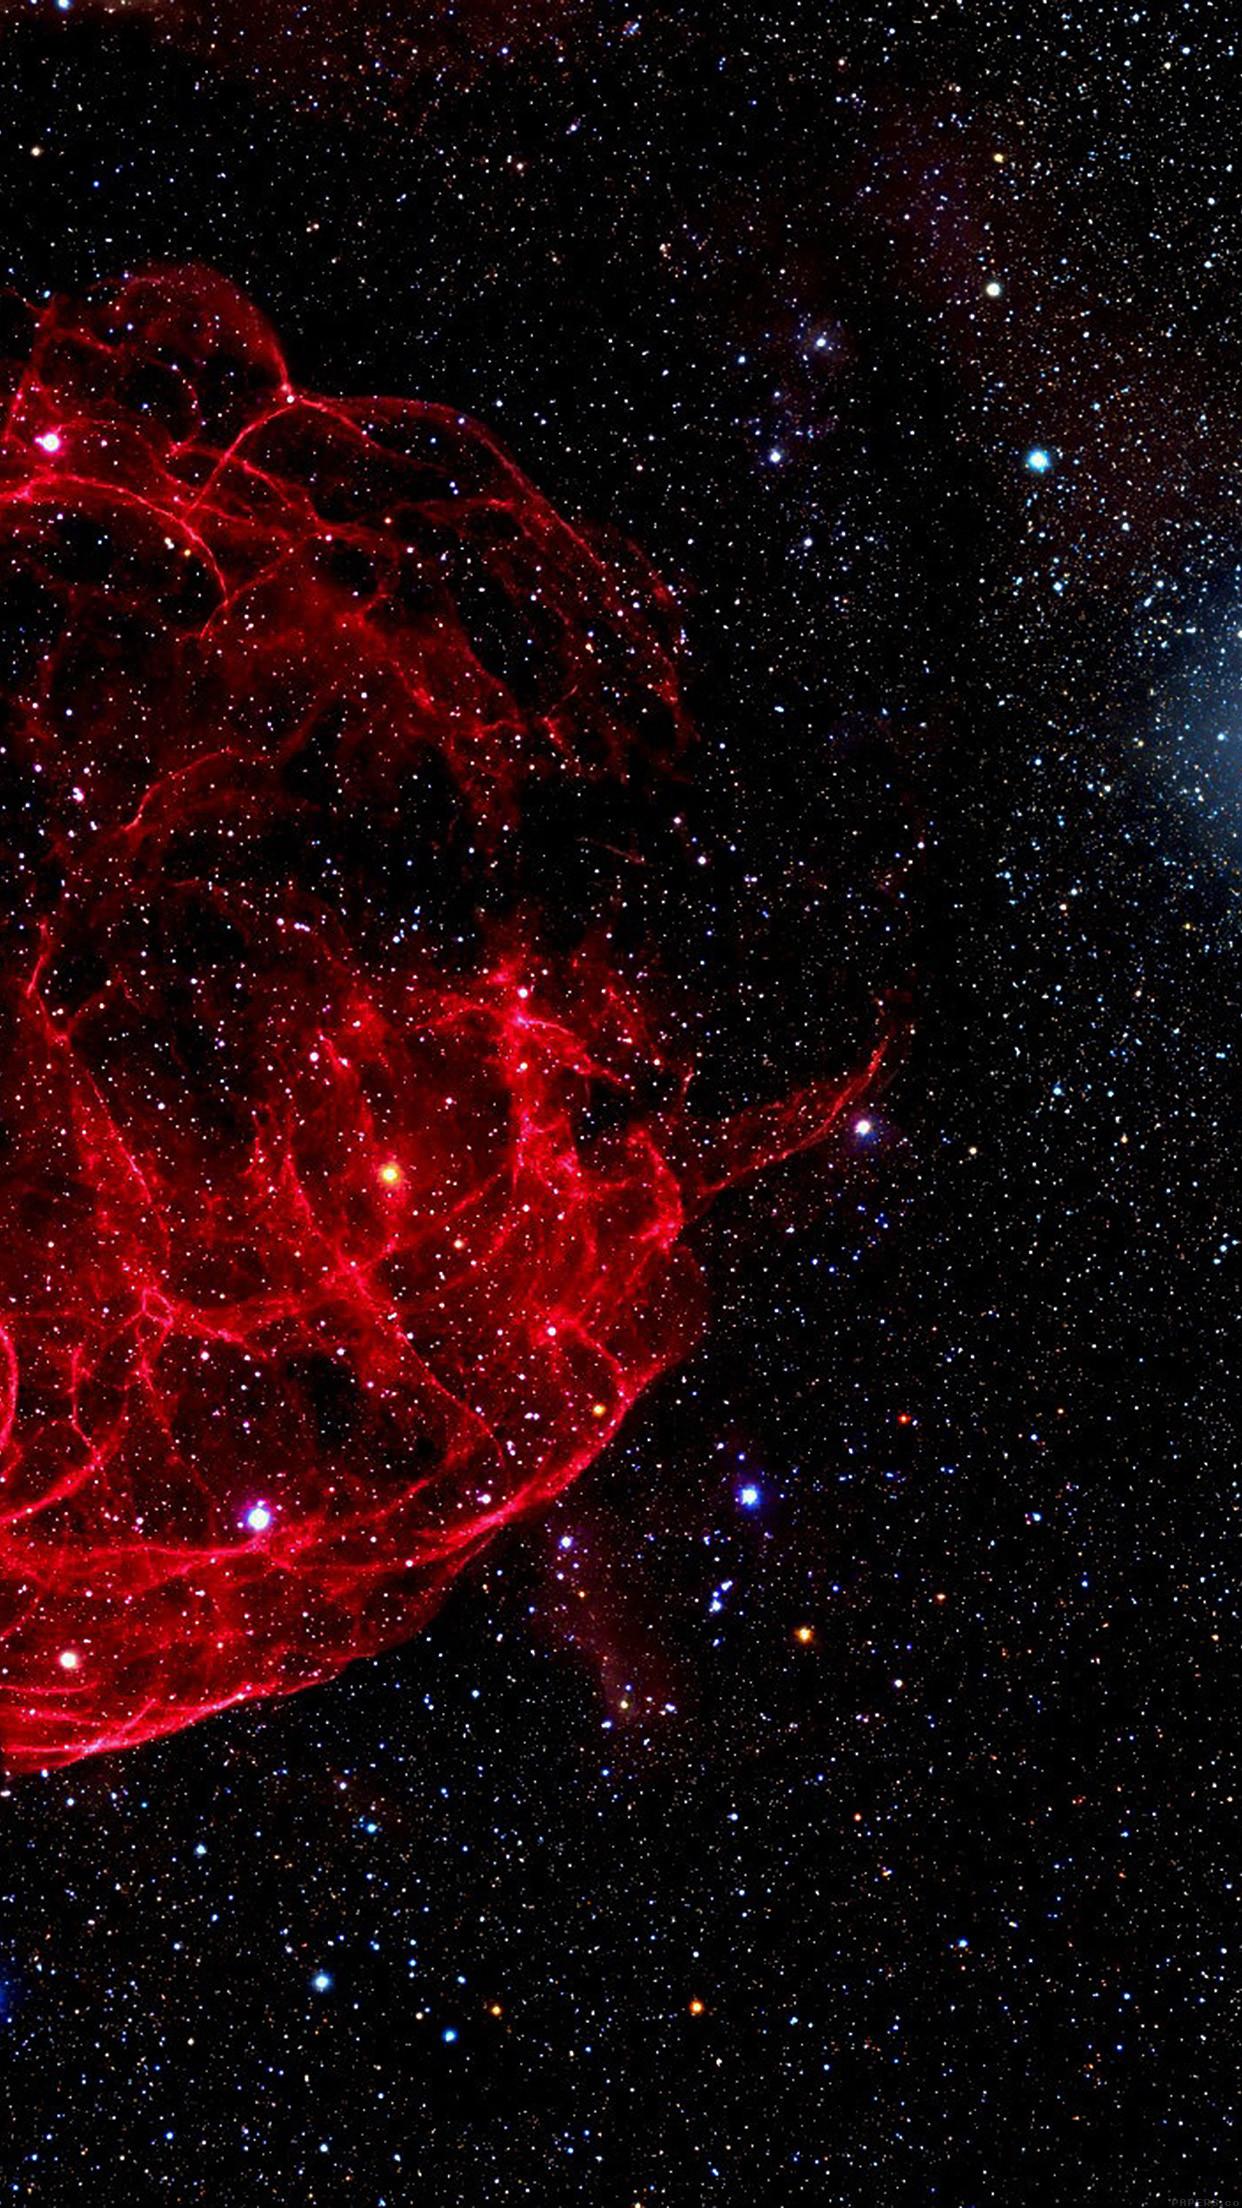 space-star-galaxy-art-pattern-9-wallpaper